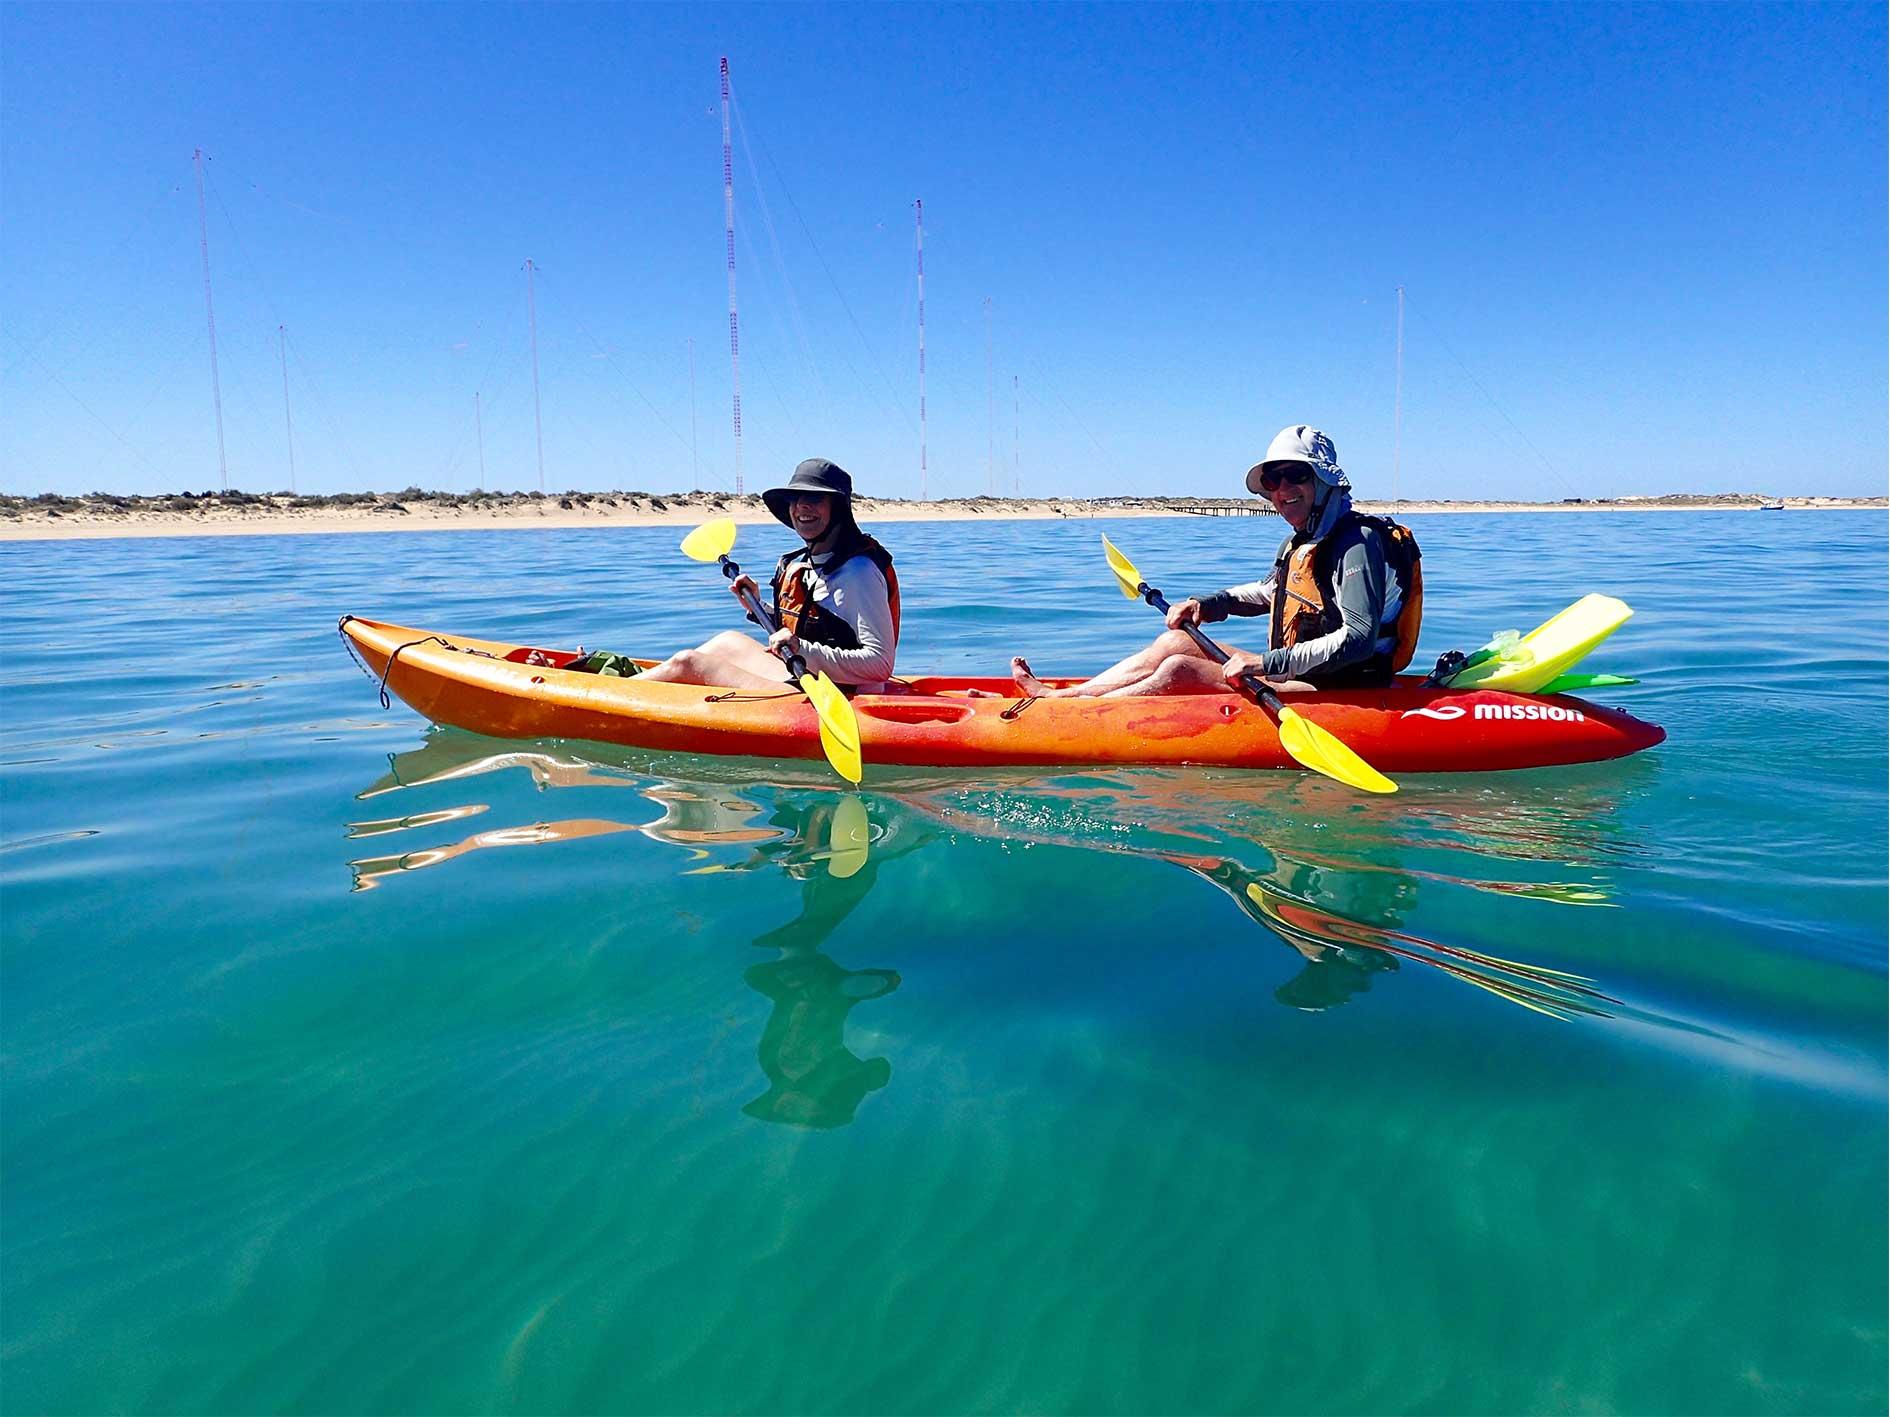 Exmouth Adventure Co, Ningaloo Reef, Snorkelling, Kayaking, Whale Shark, Cape Range National Park, Western Australia, Kayaking, Surfing, SUP, Stand Up Paddle Board, Arvo Cruiser, sea kayak tour, Gift Vouchers, Gift Vouchers Exmouth, Gift Vouchers Ningaloo, Experience Gifting